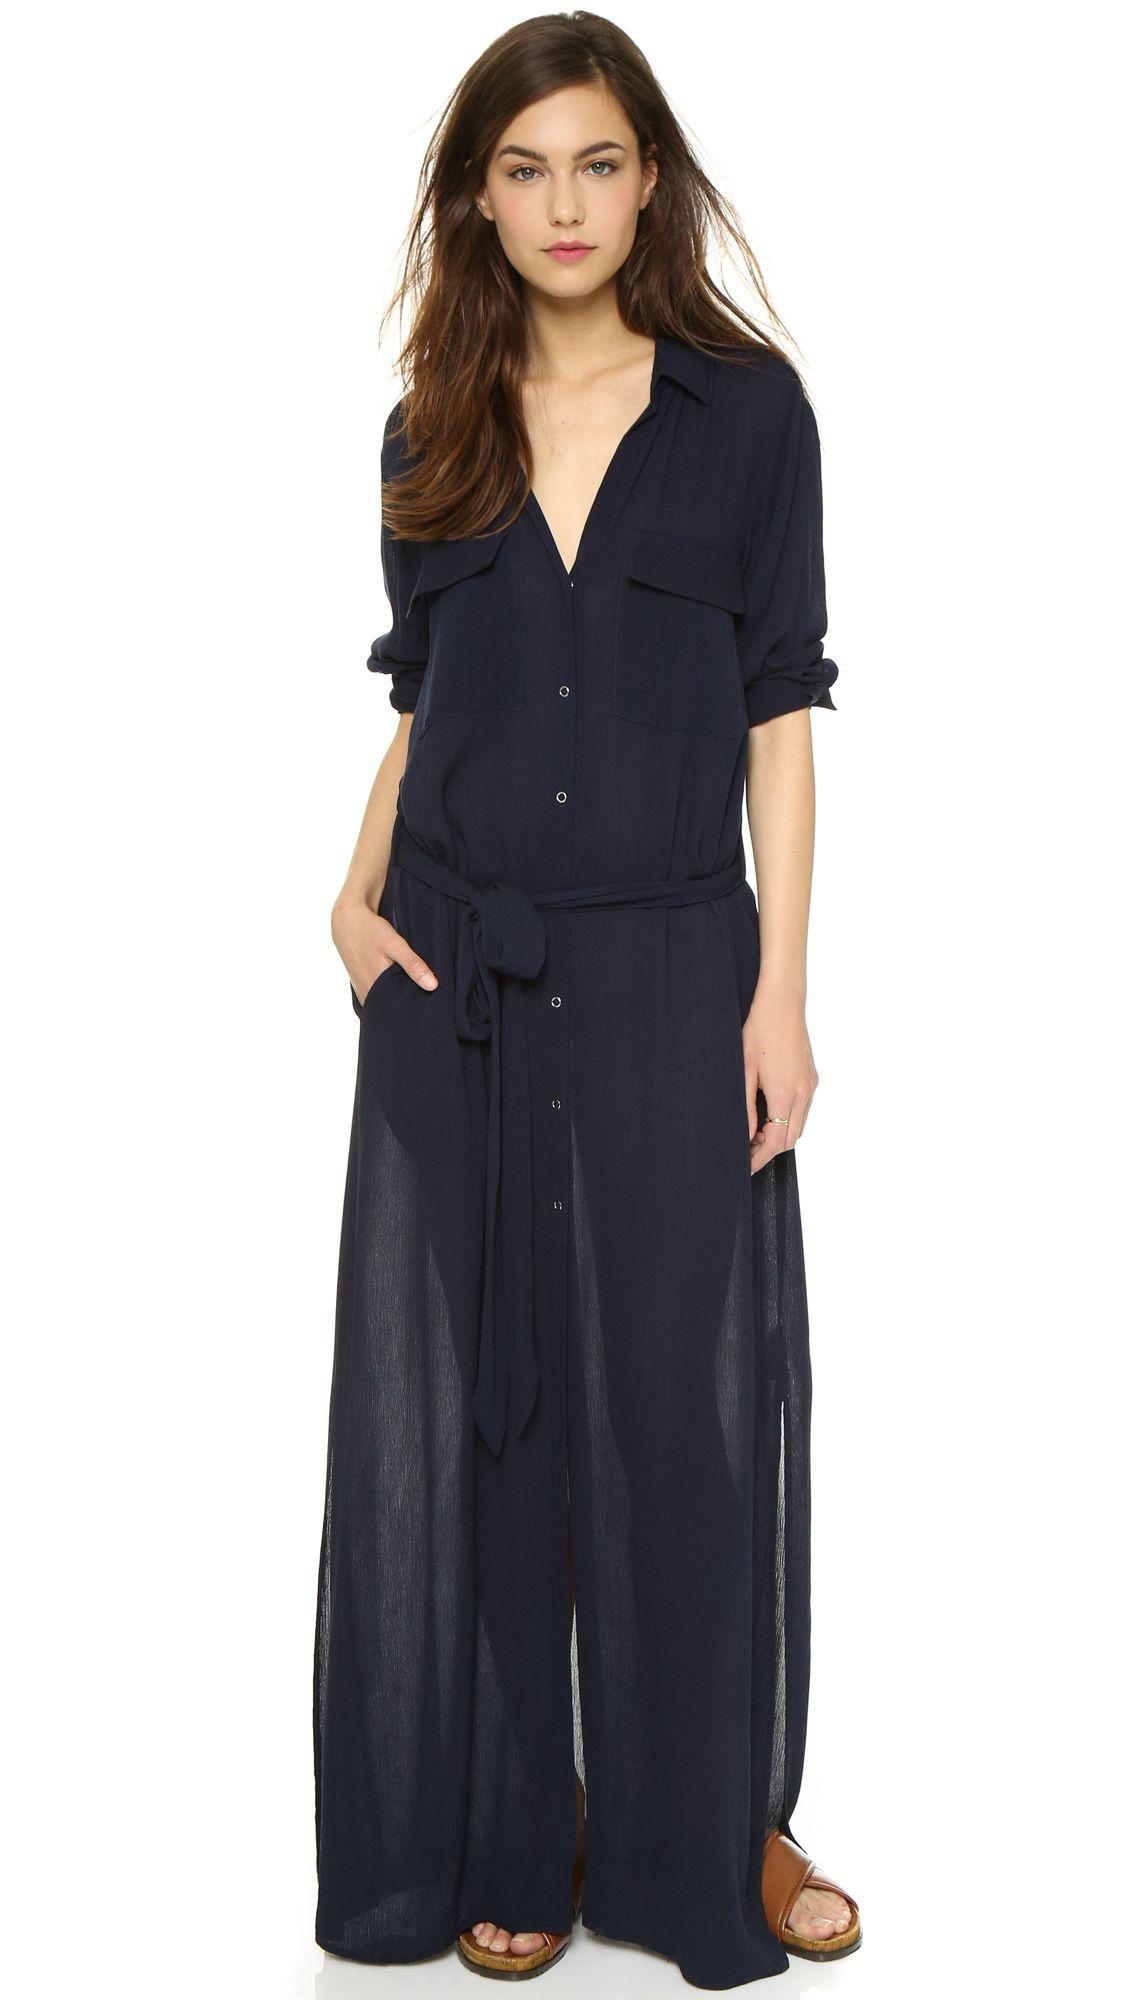 Midnight Created By Shopbop Beach L'agence Dress Maxi Alani com wAIxqBTn